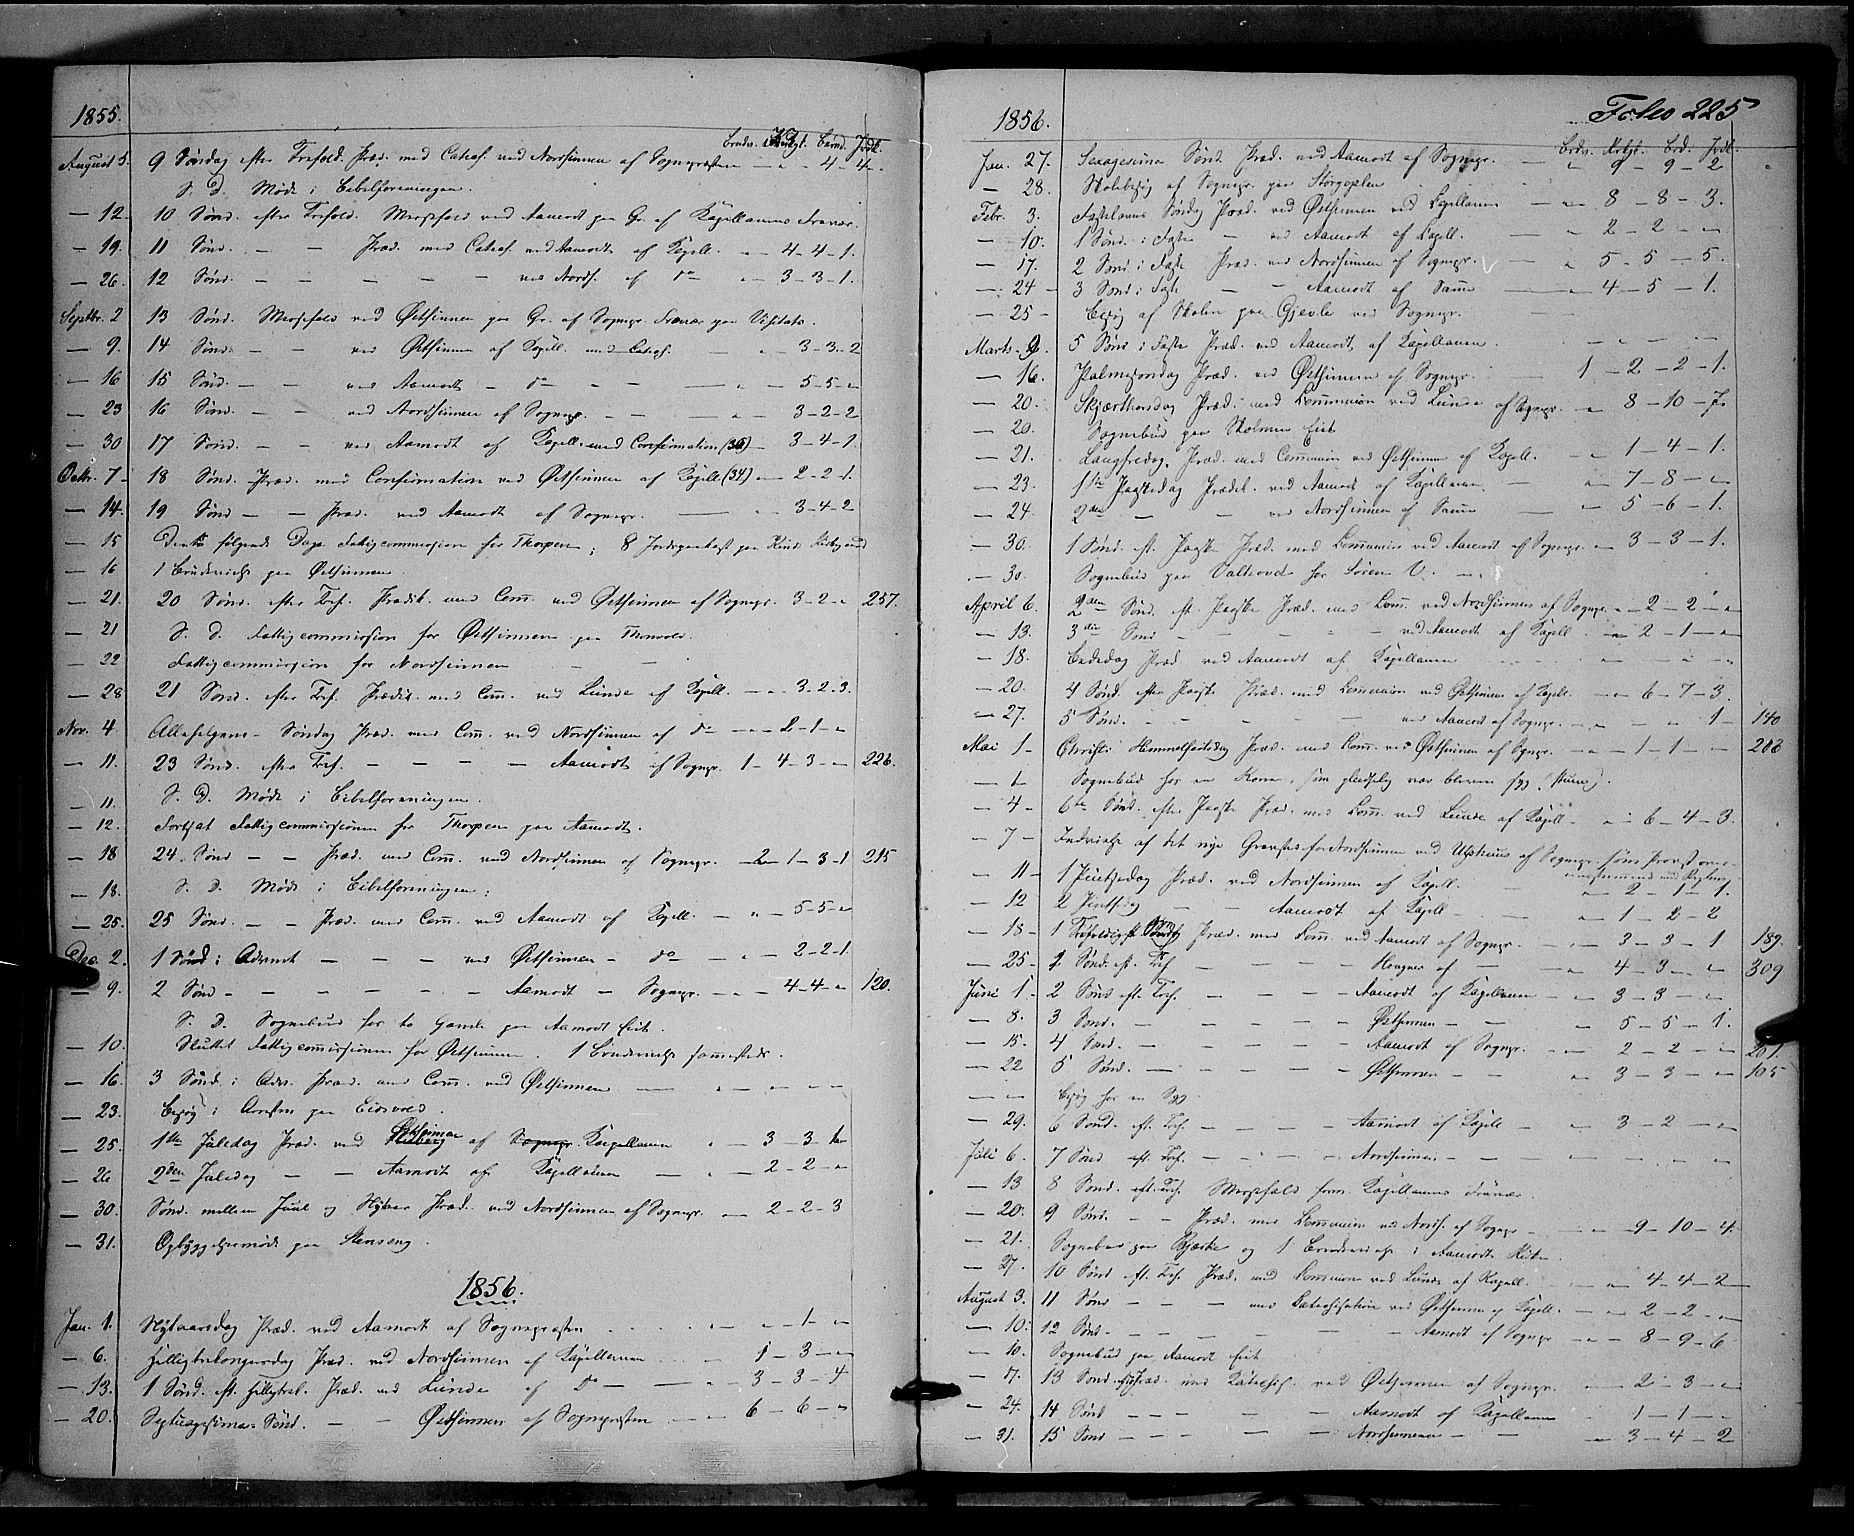 SAH, Land prestekontor, Ministerialbok nr. 10, 1847-1859, s. 225